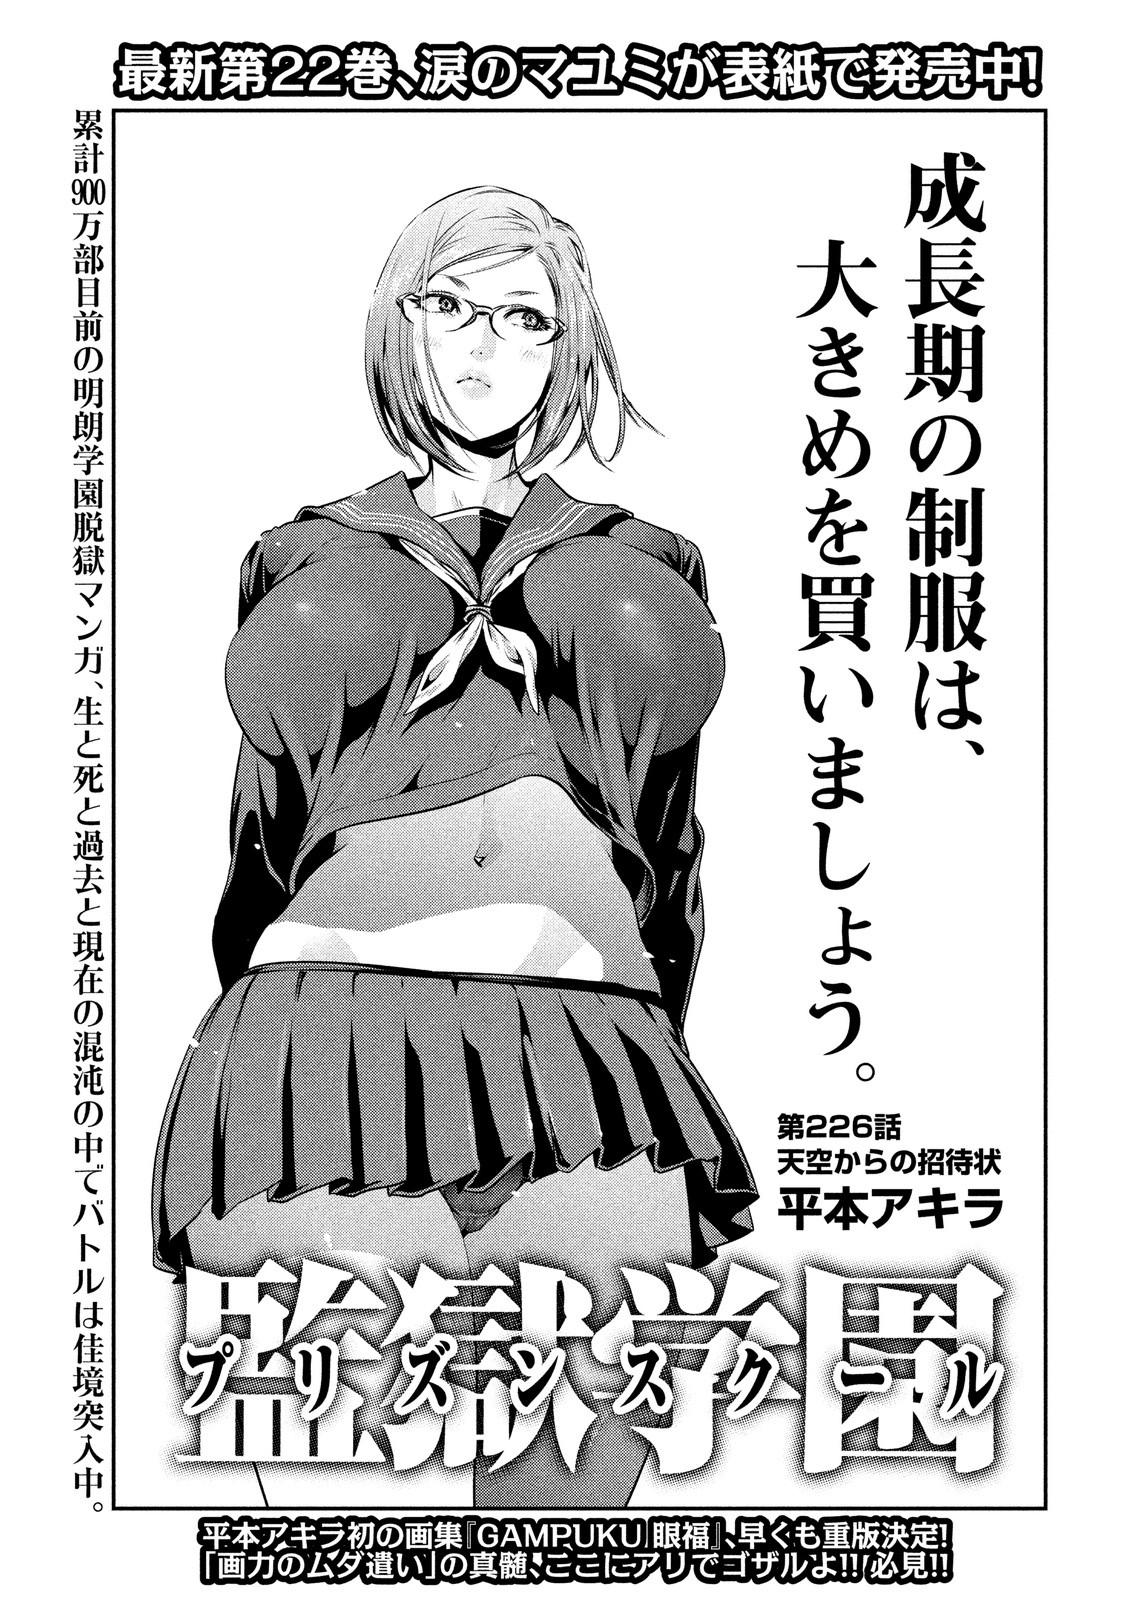 Prison school kangoku gakuen anime uncensored 5 2015 - 3 part 10